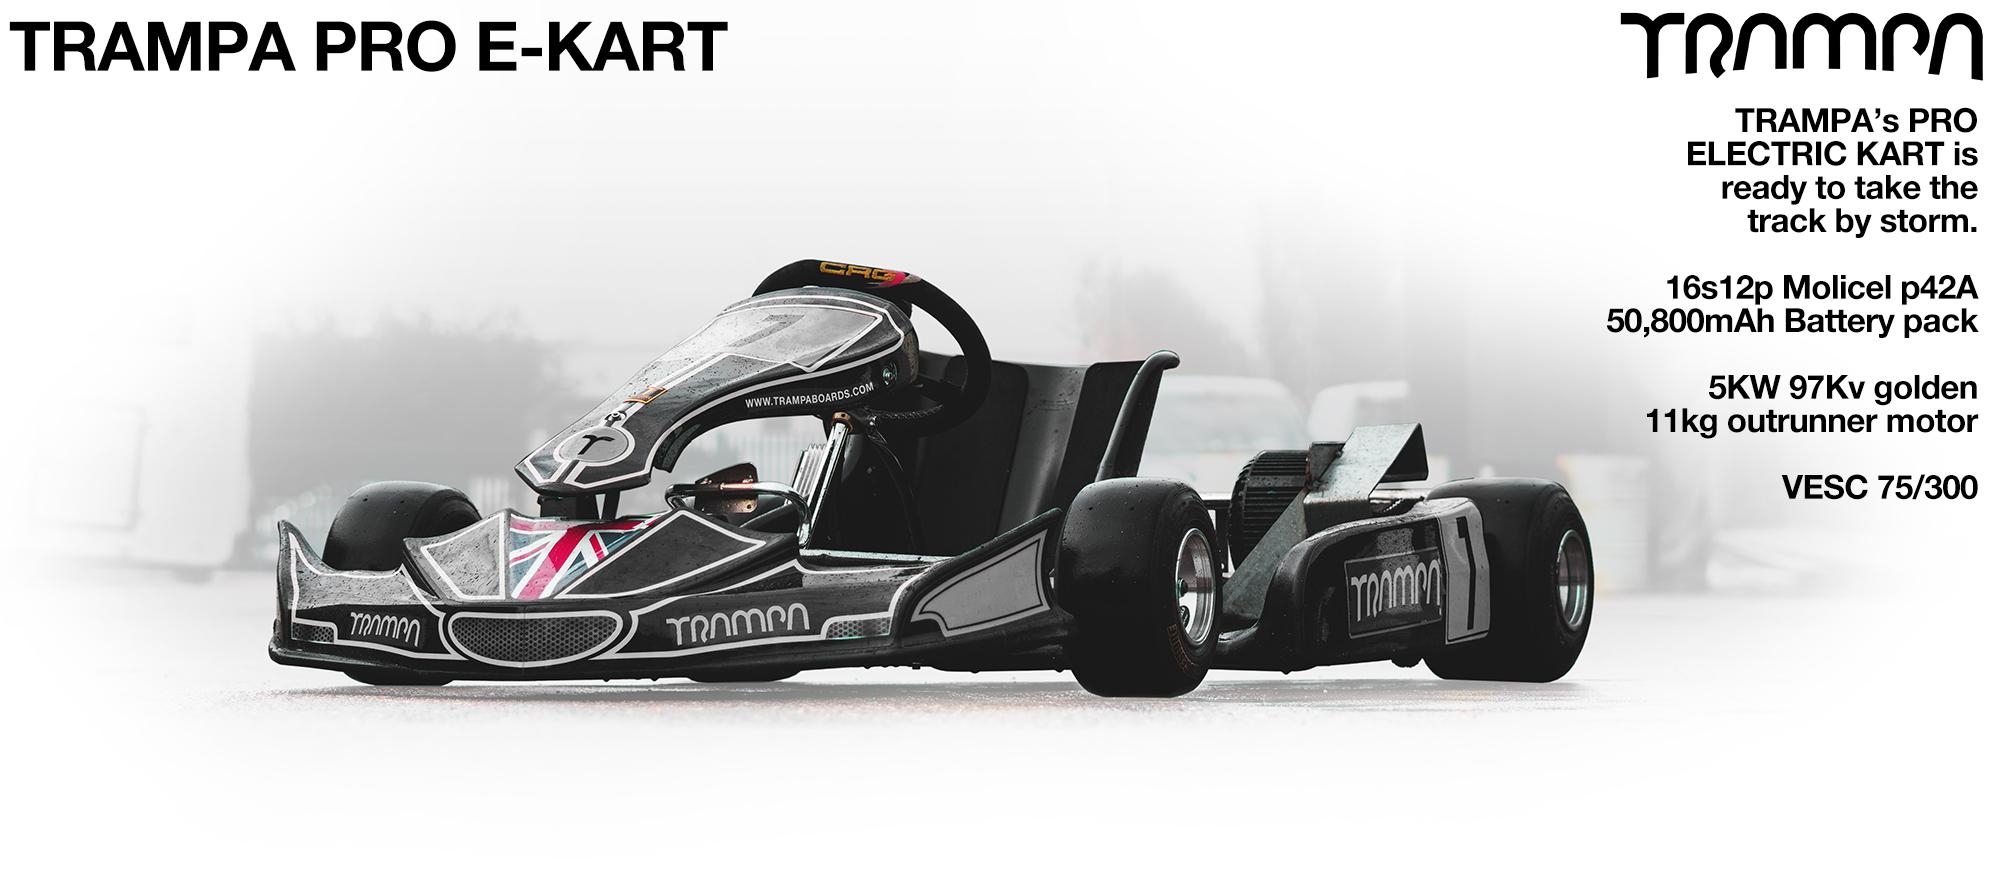 TRAMPA's Pro-Kart Go-Kart